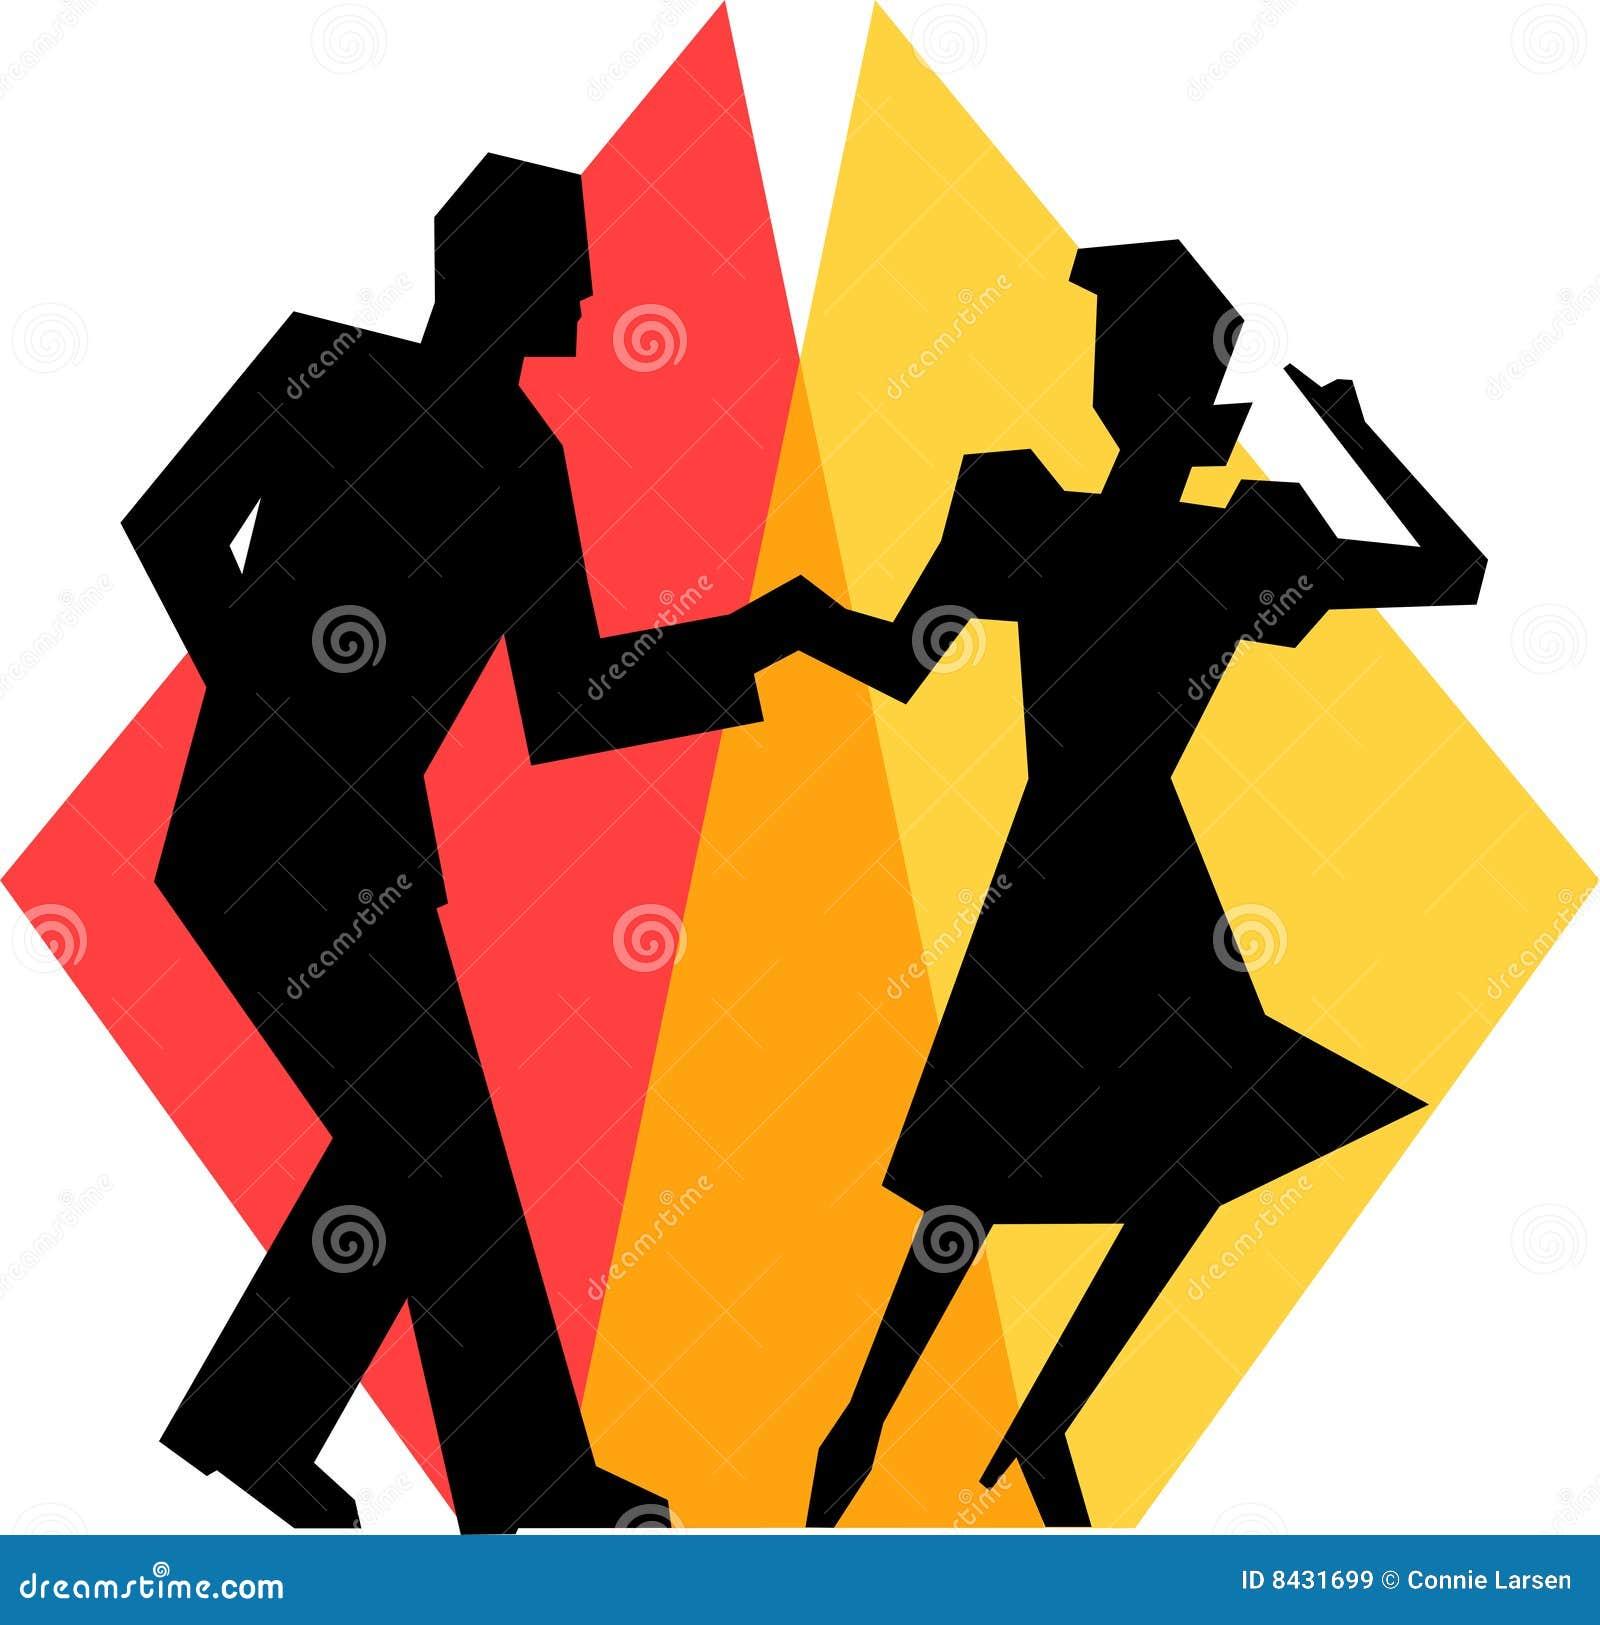 Simple Swing Dance Couple/eps